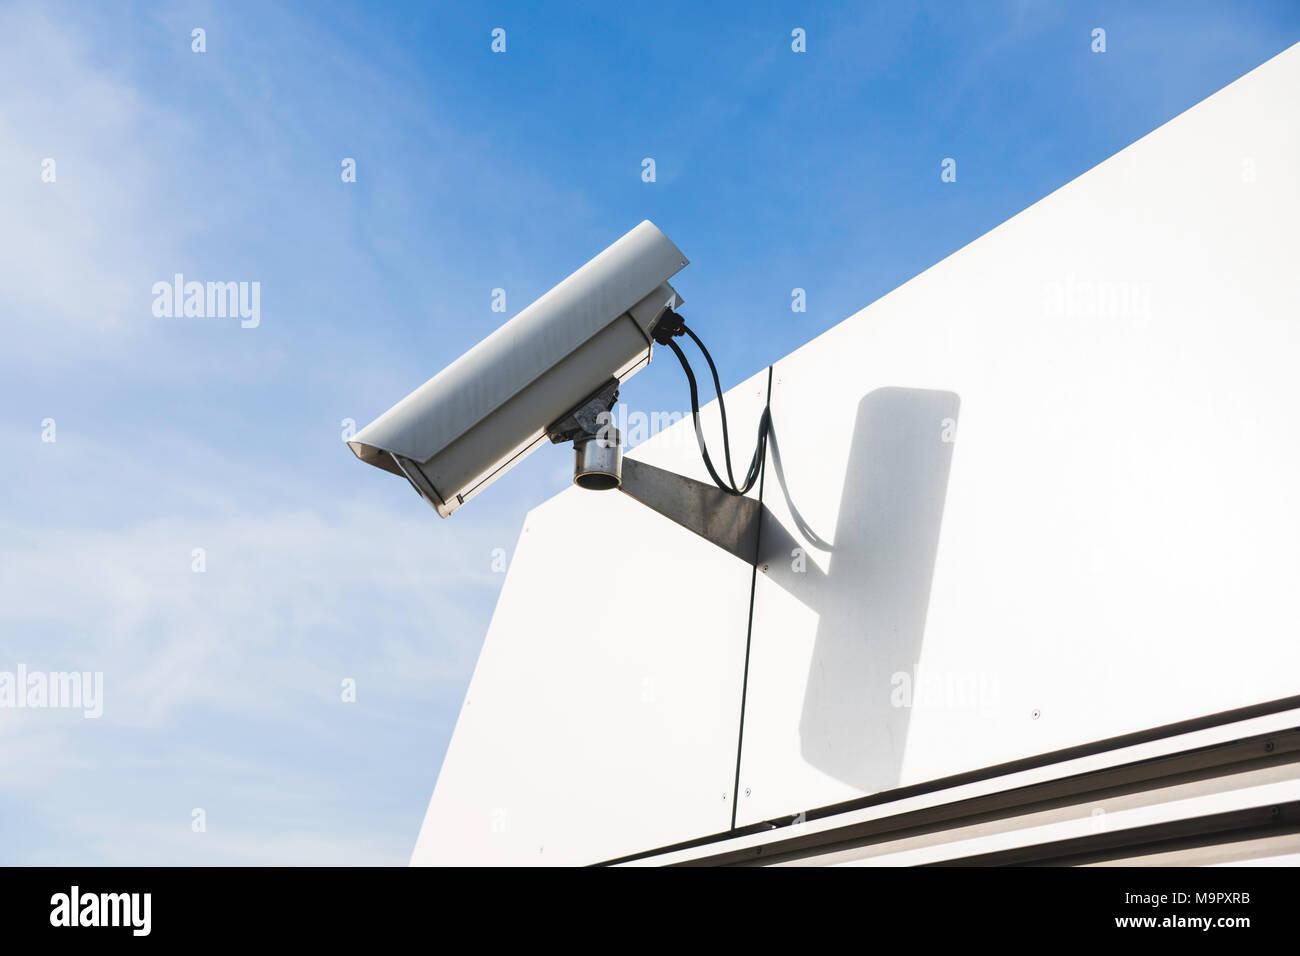 Surveillance camera, video surveillance, Hamburg, Germany - Stock Image